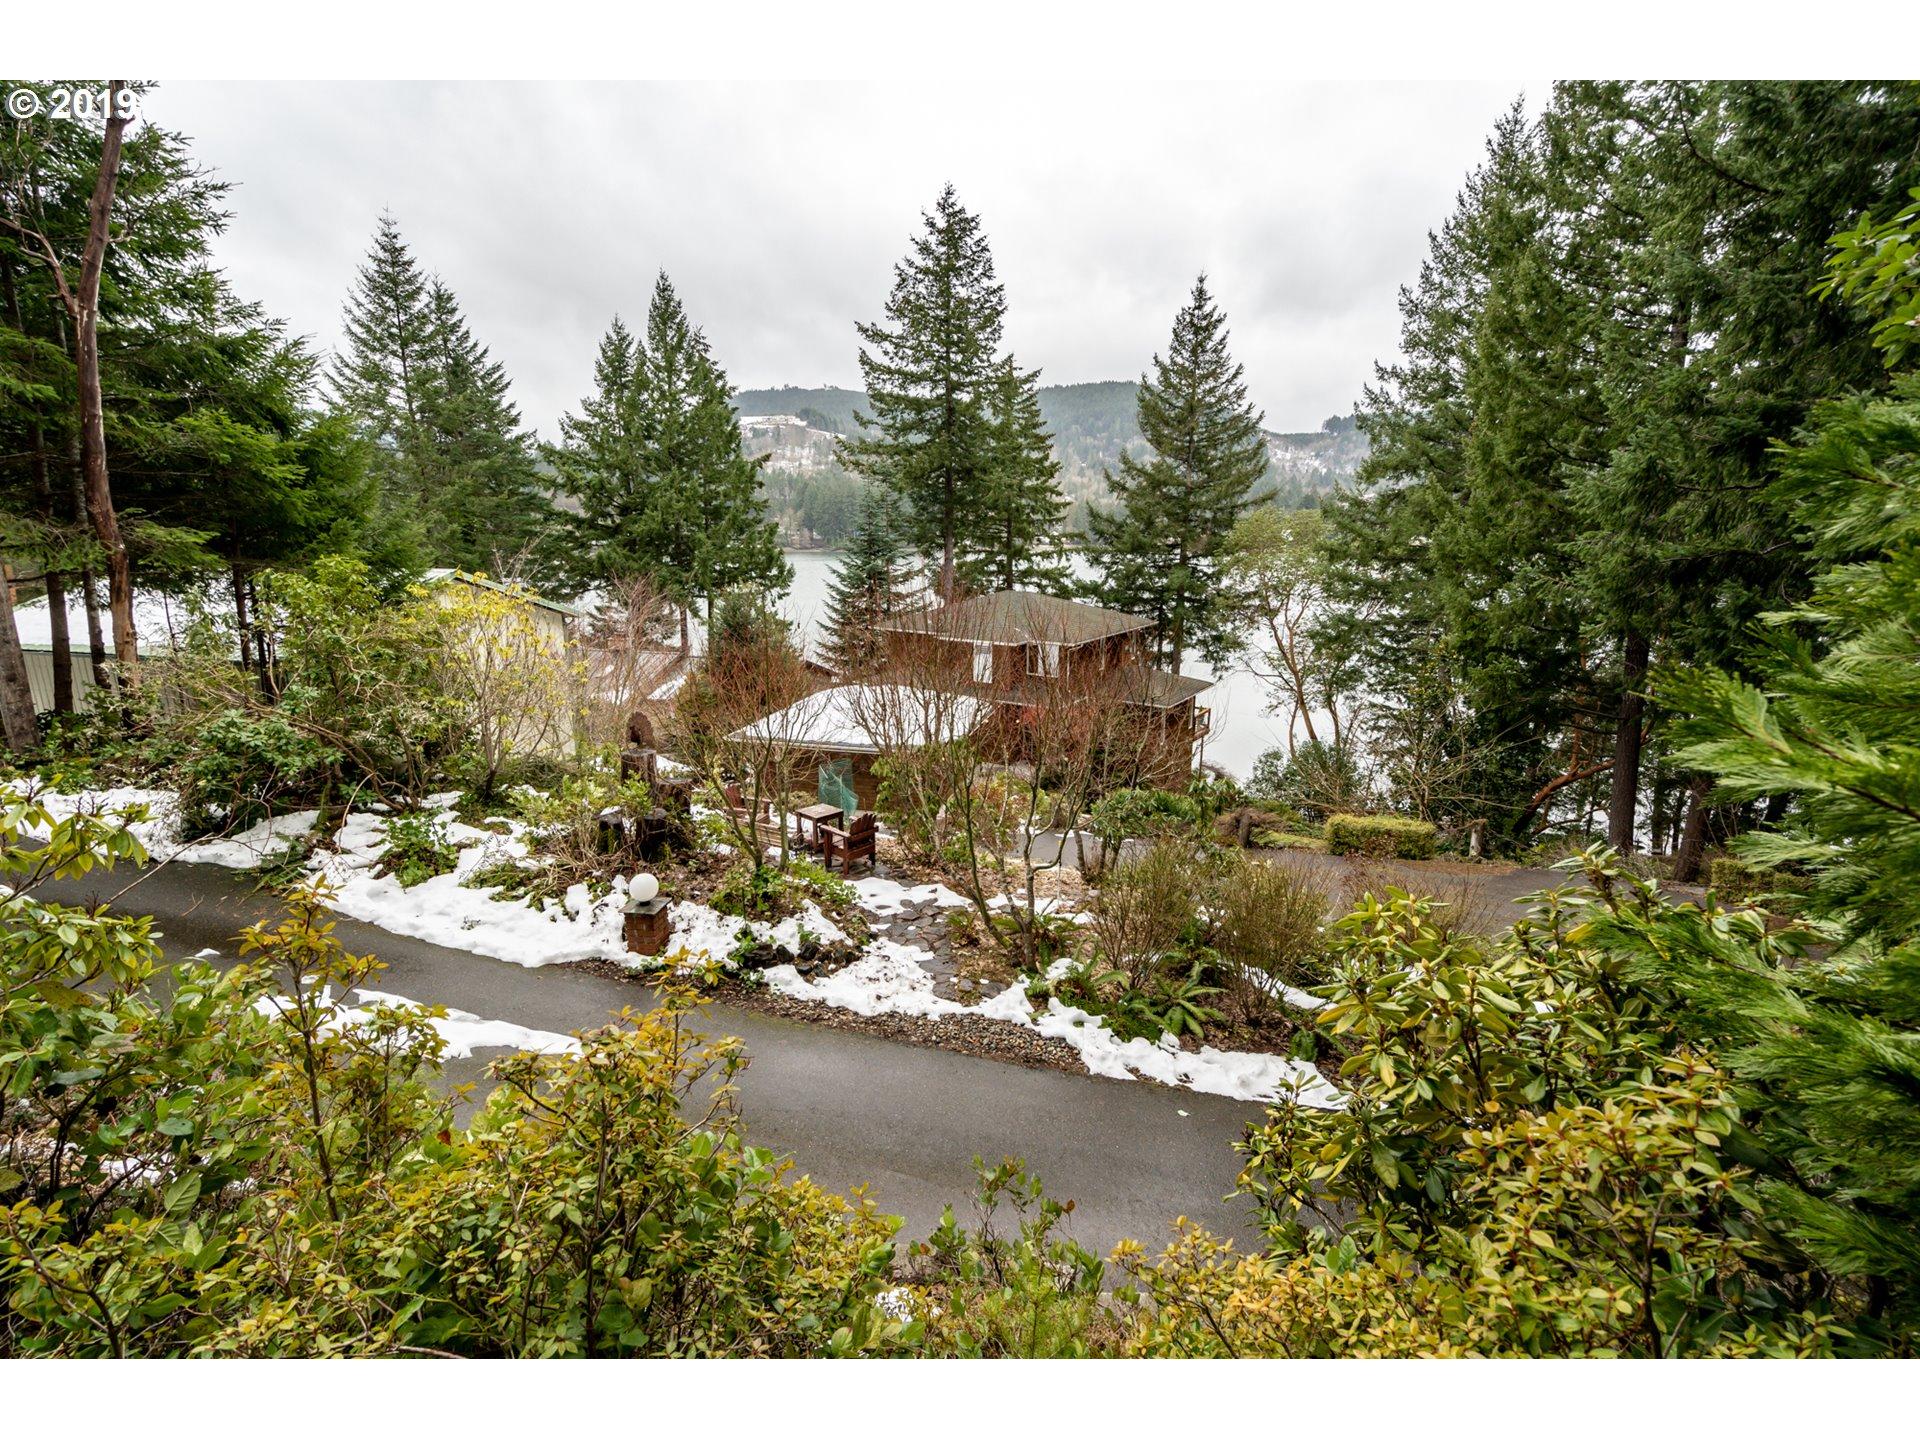 Hood River Real Estate - Don Nunamaker, Realtors - Homes For Sale